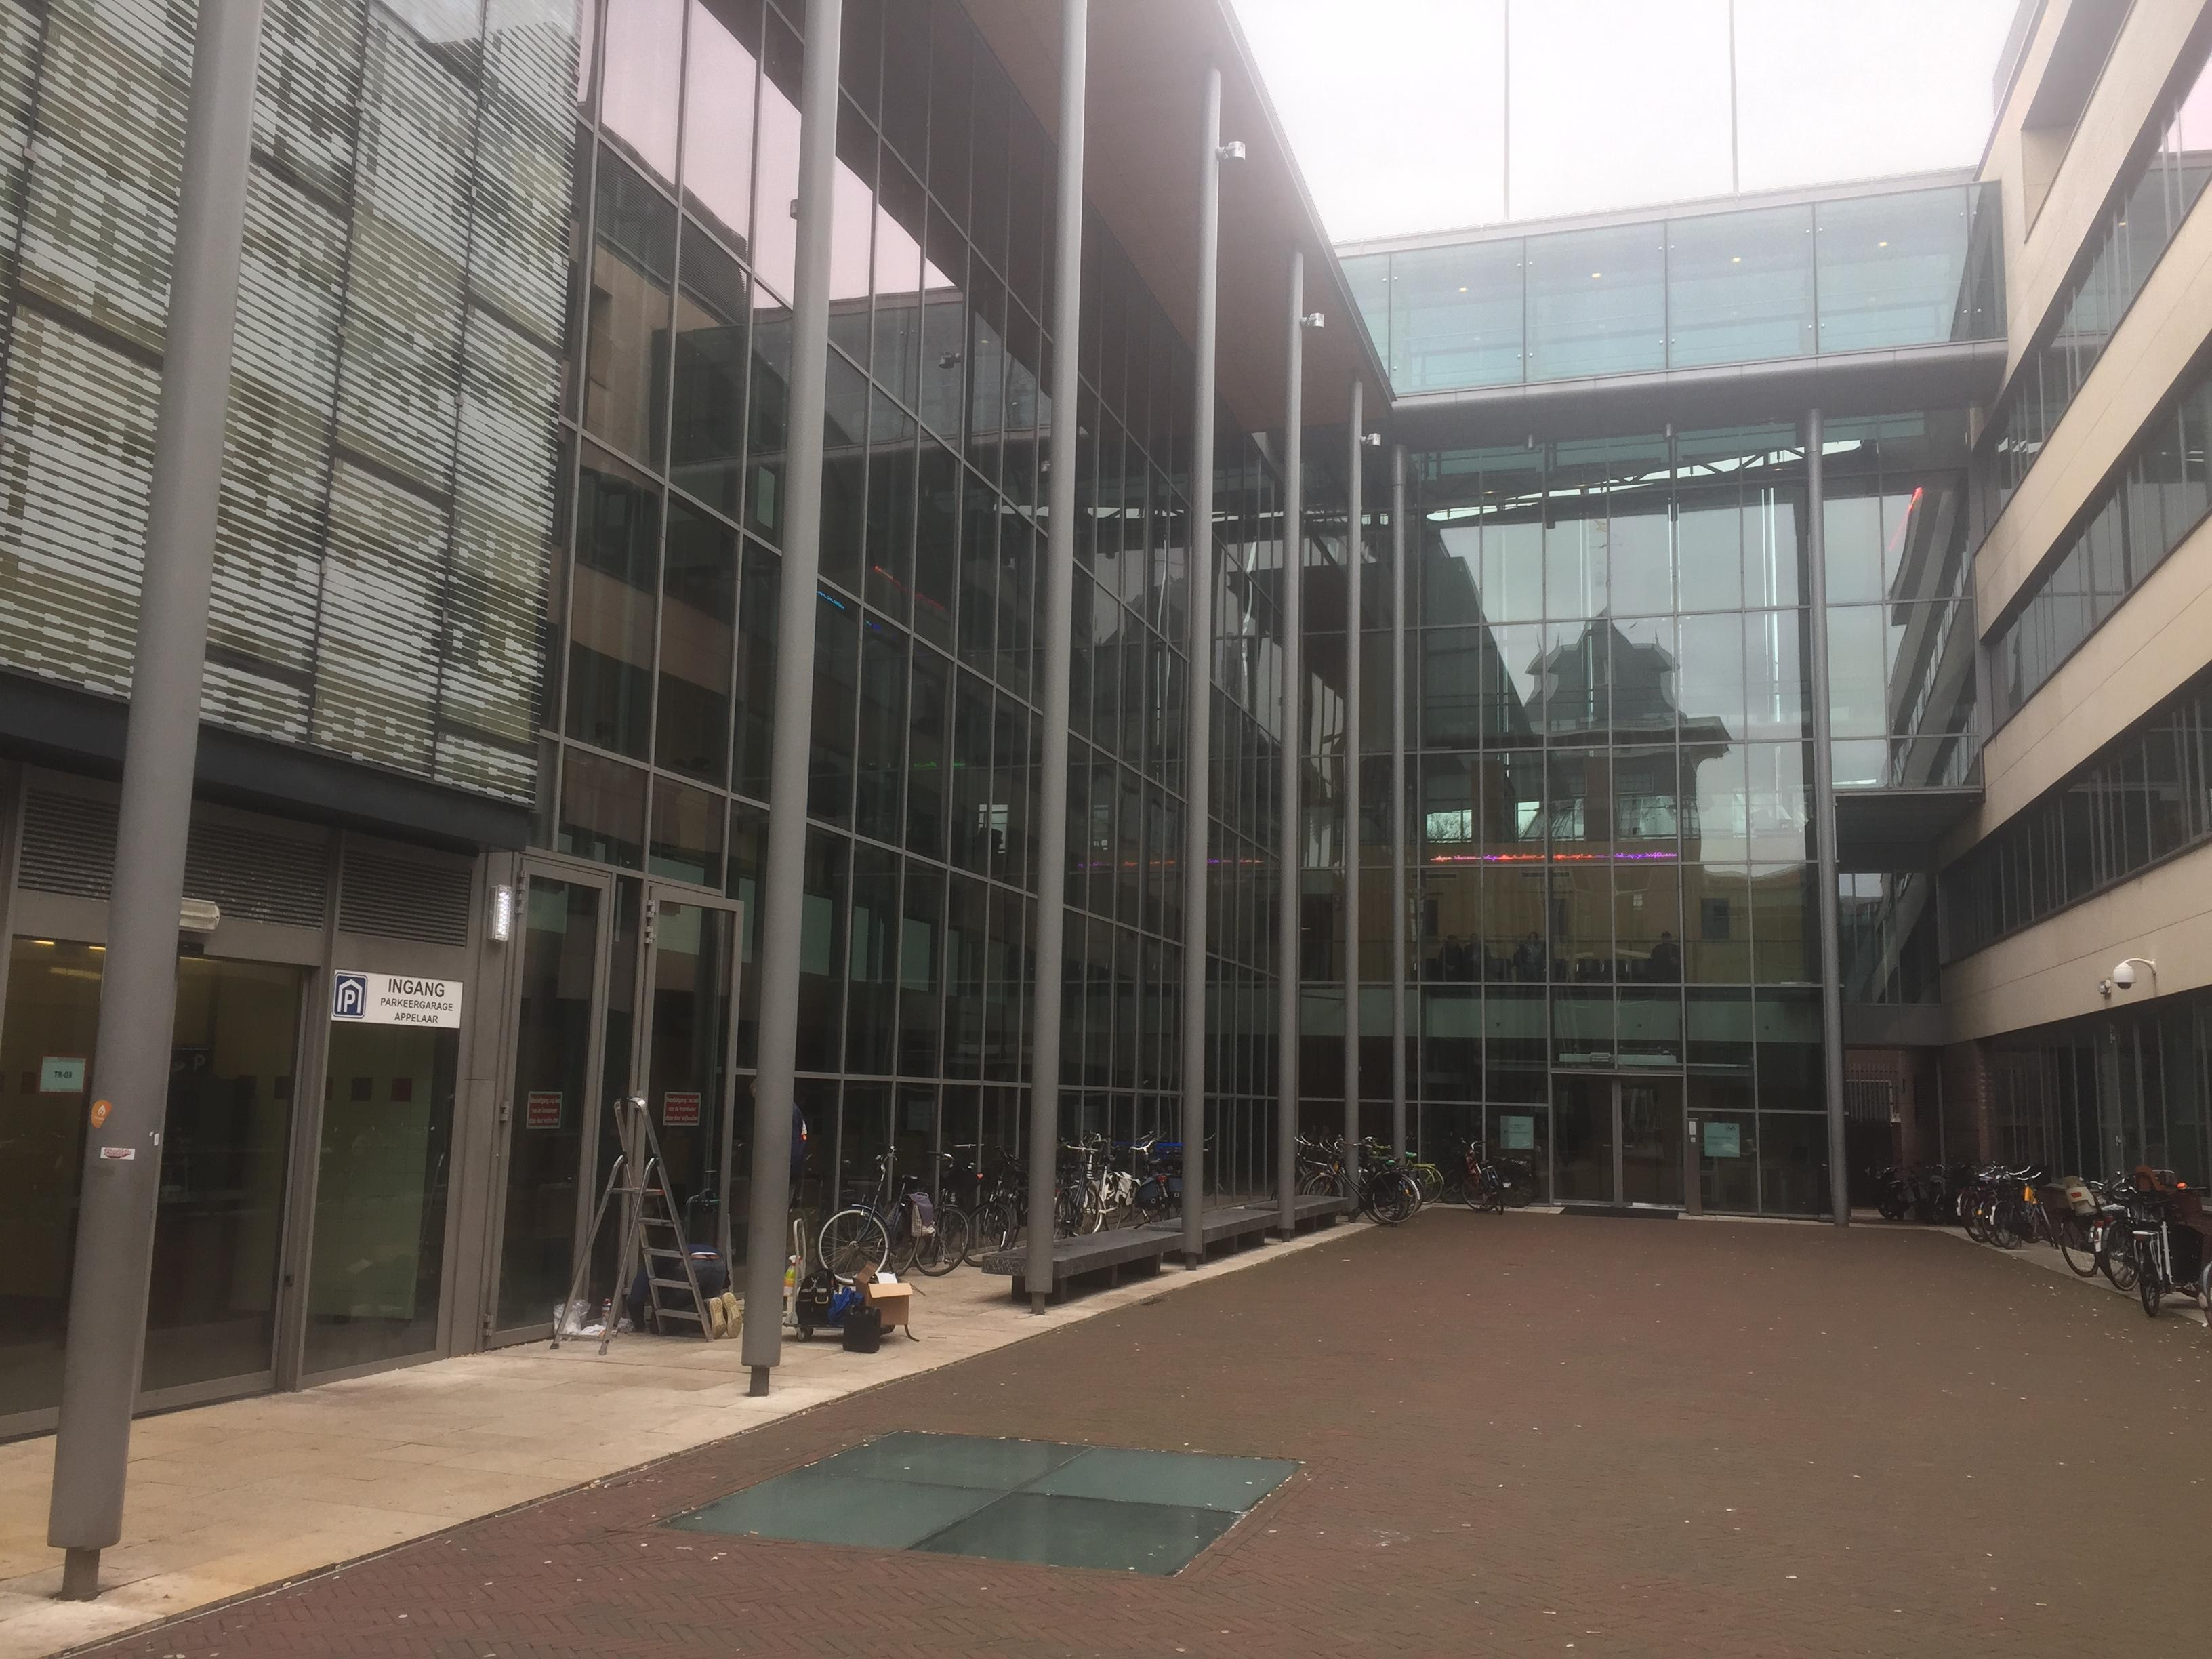 OM: Man probeerde in Haarlem zes keer in te breken op één dag